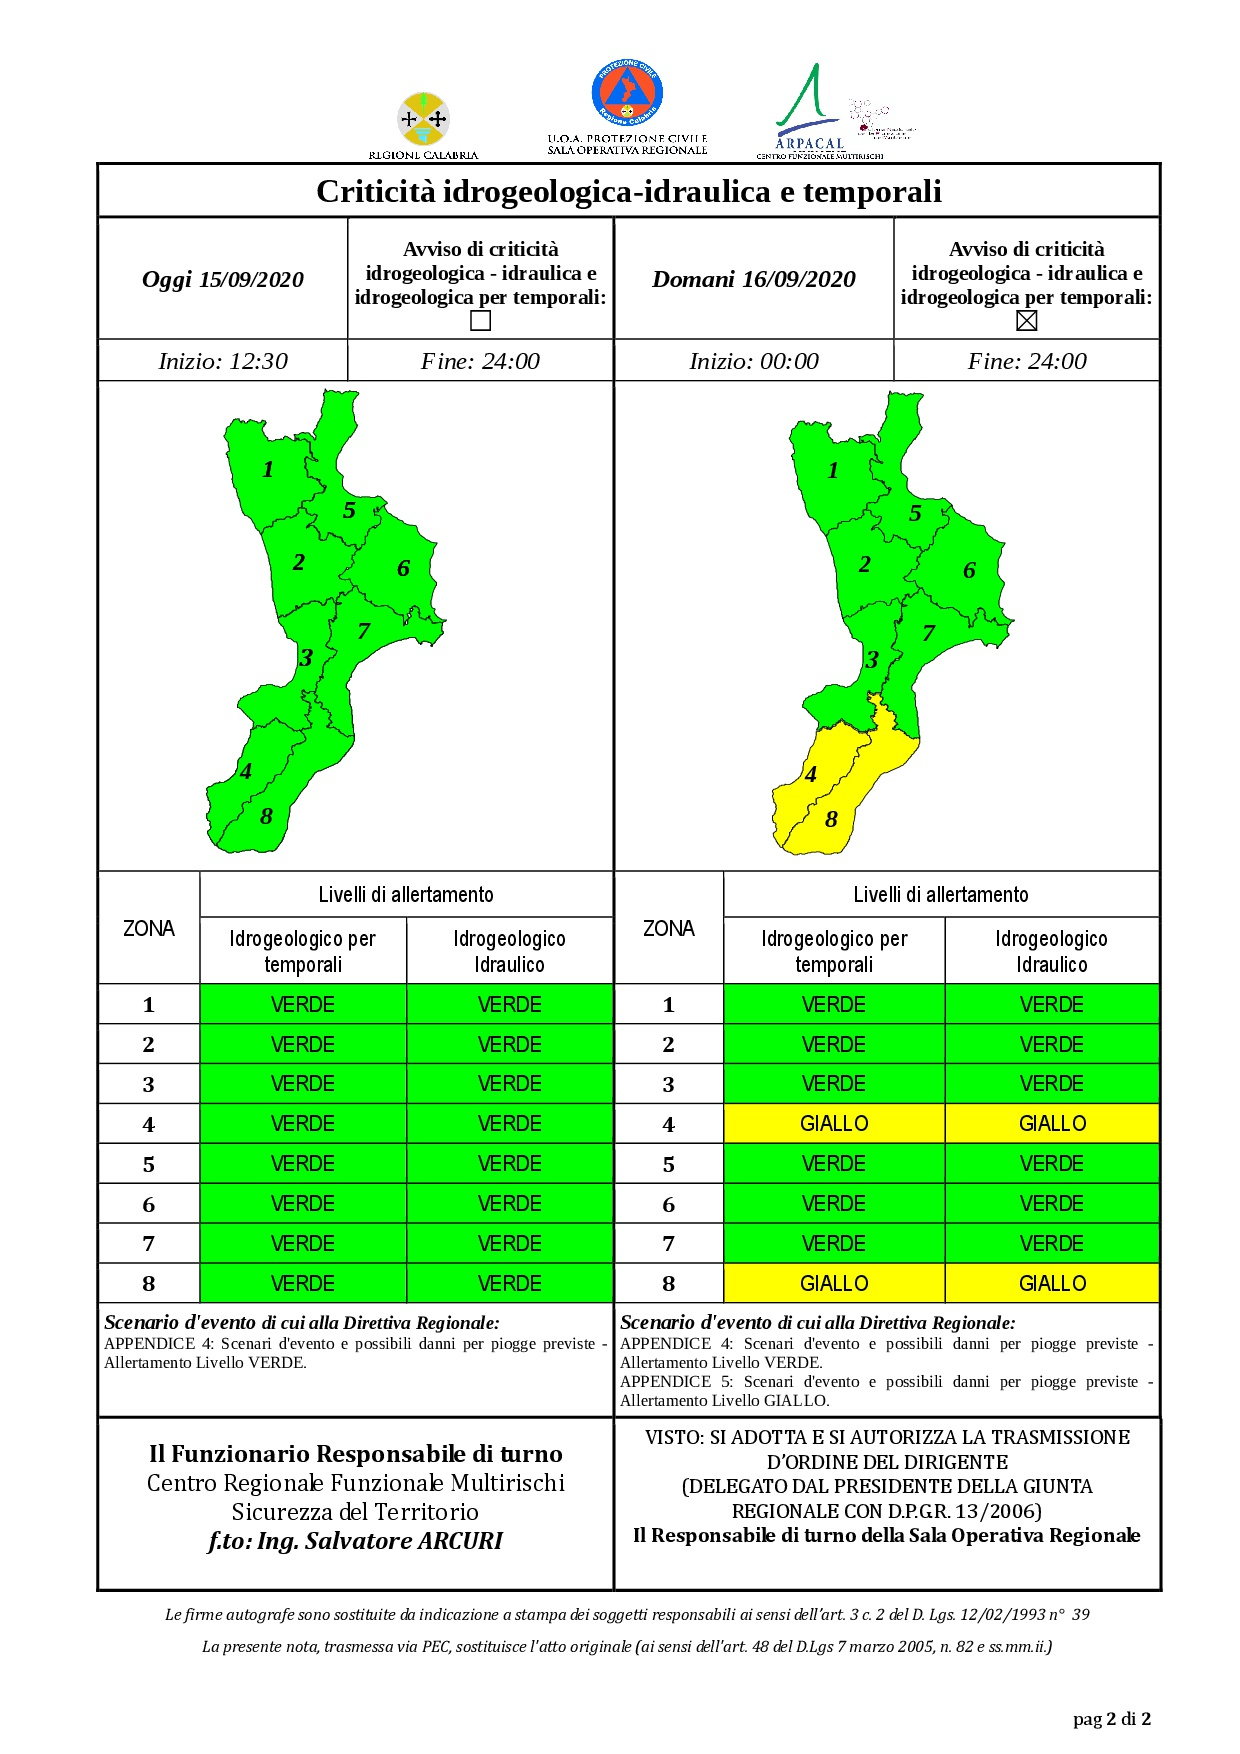 Criticità idrogeologica-idraulica e temporali in Calabria 15-09-2020